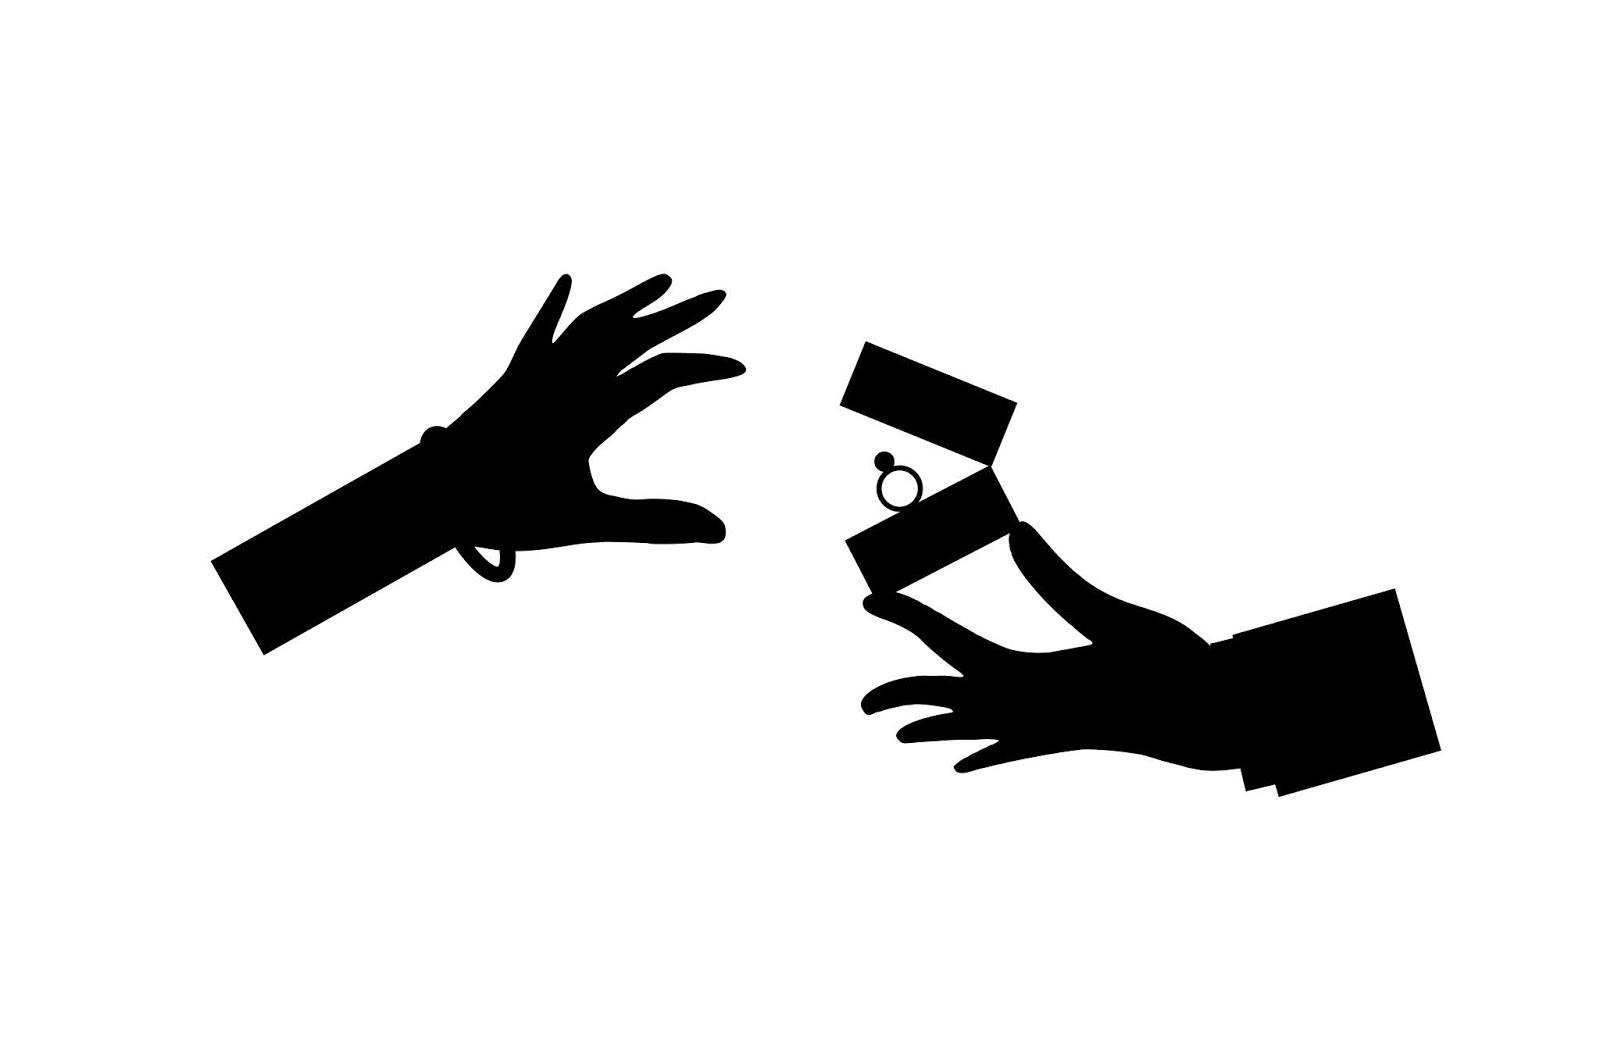 Illustration of wedding rings silhouette